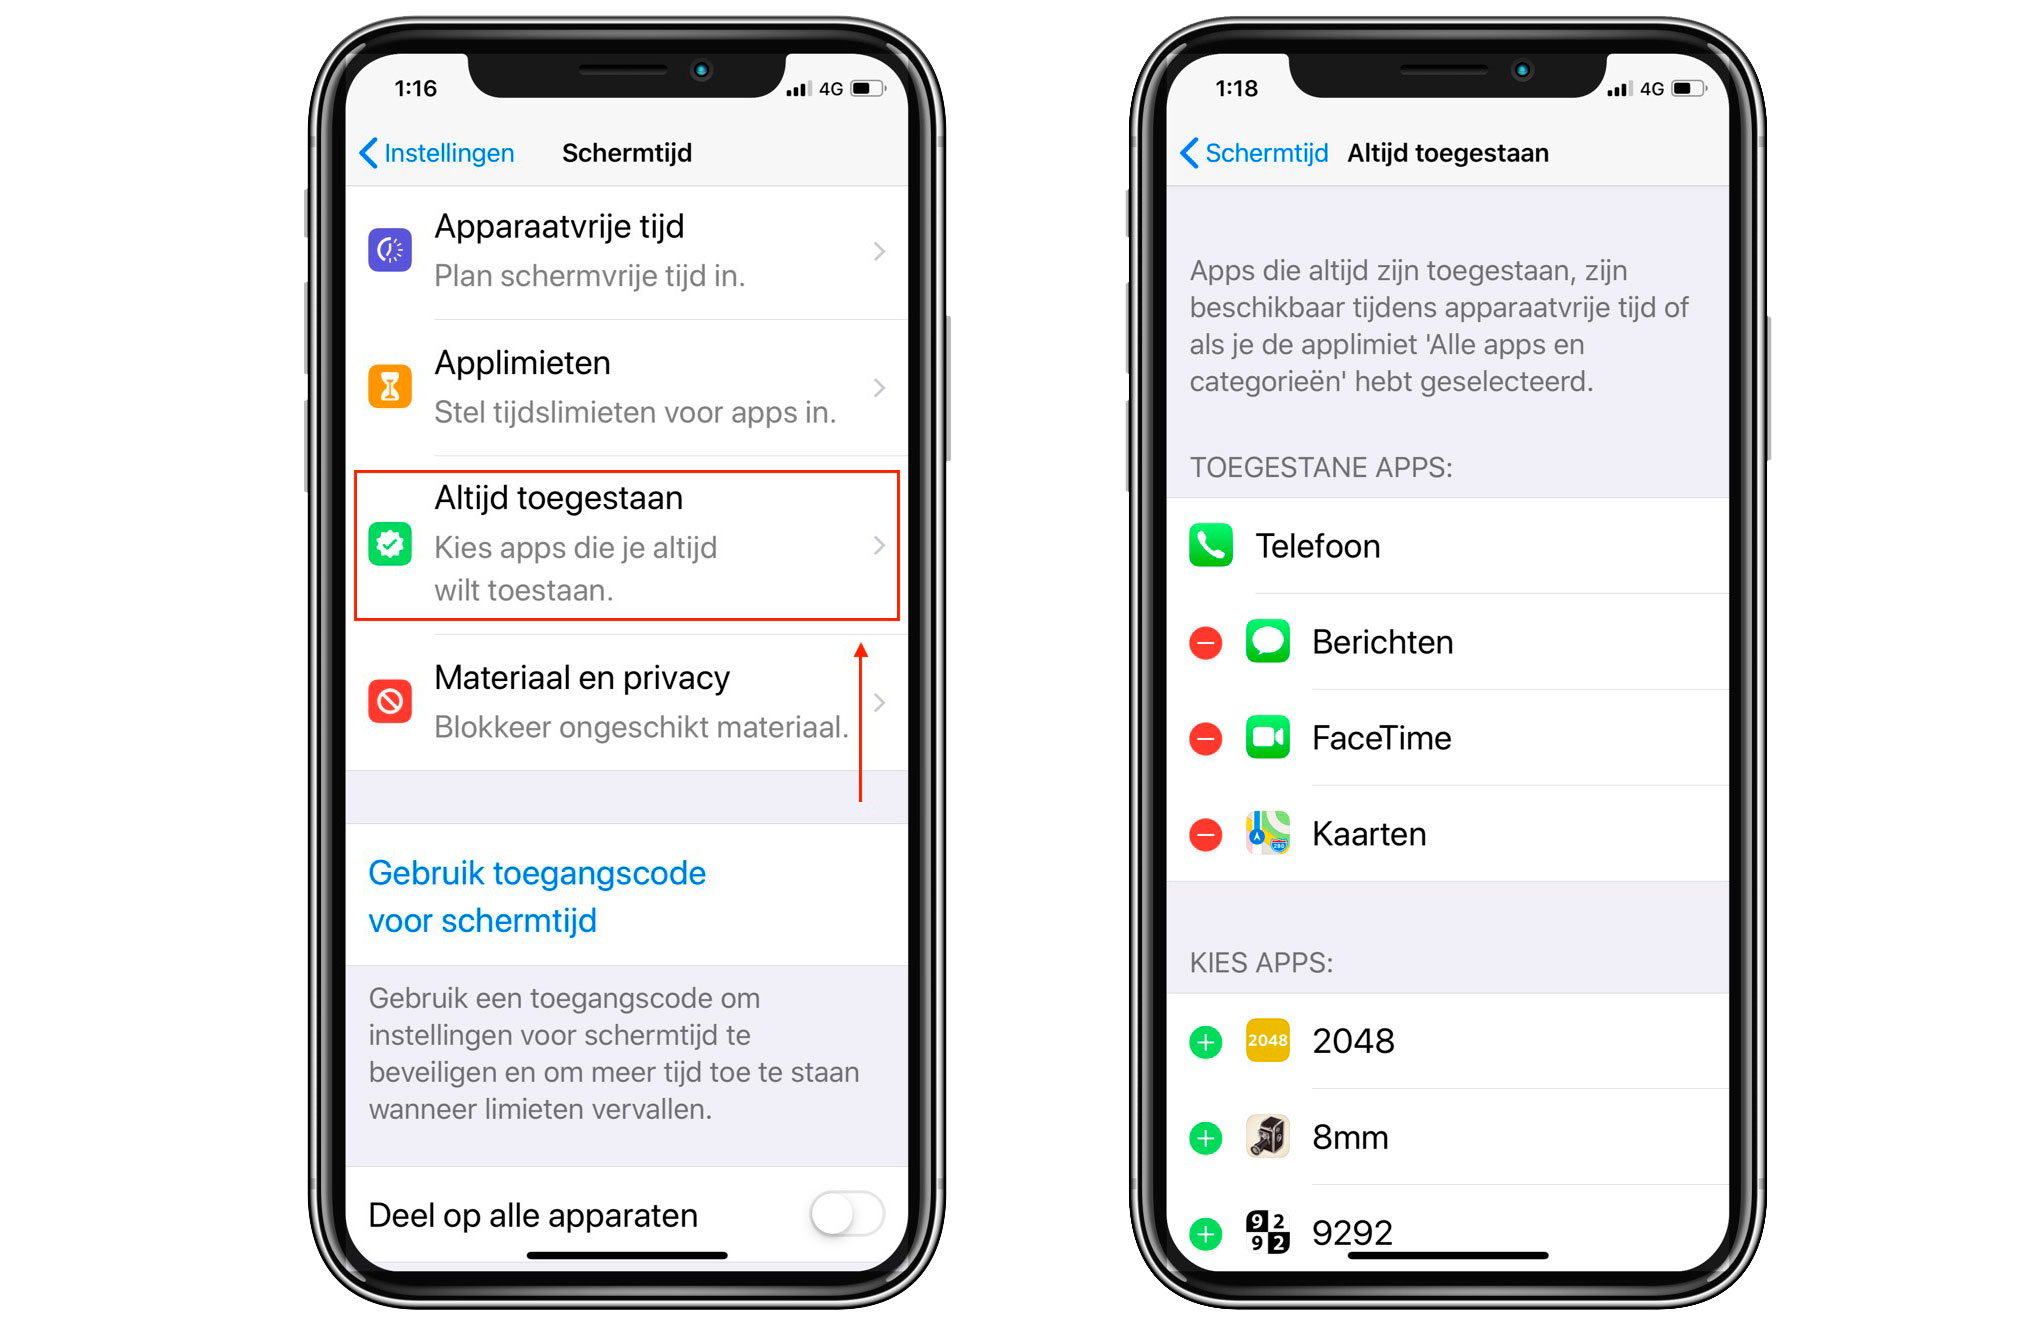 https://www.macfreak.nl/modules/news/images/zArt.SchermtijdAlsAppBeveiling-3.jpg